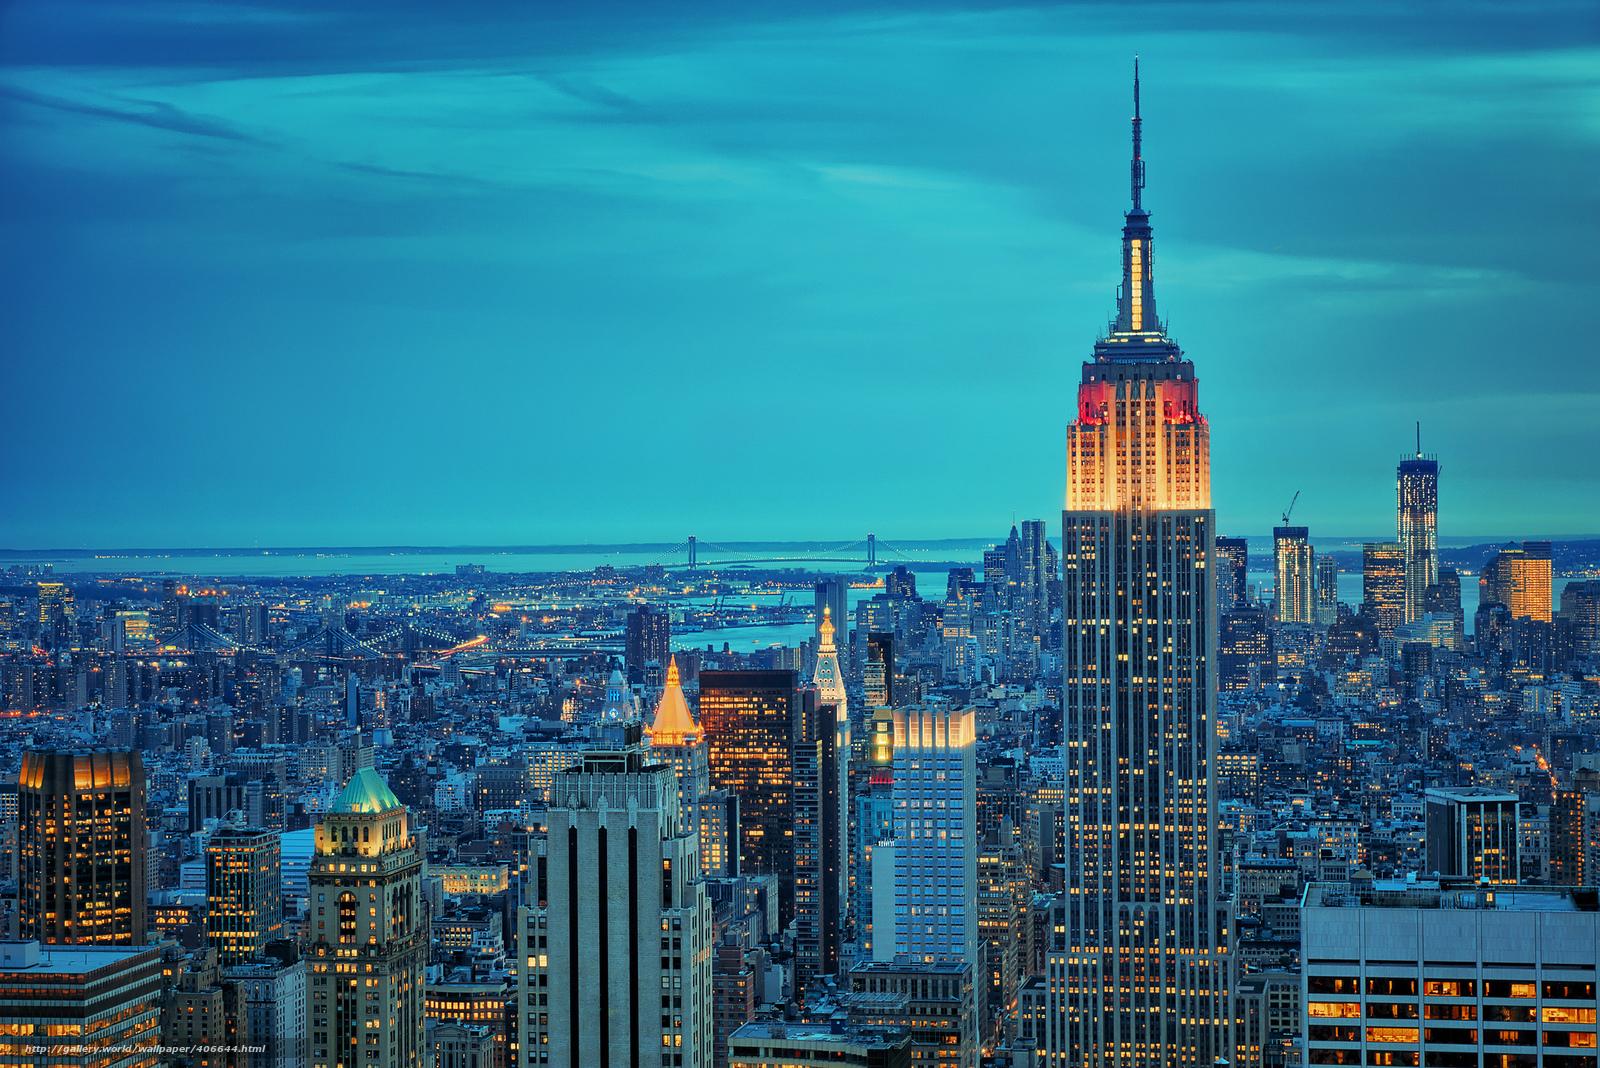 Tlcharger Fond Decran Ville New Yorkais New York Nuit